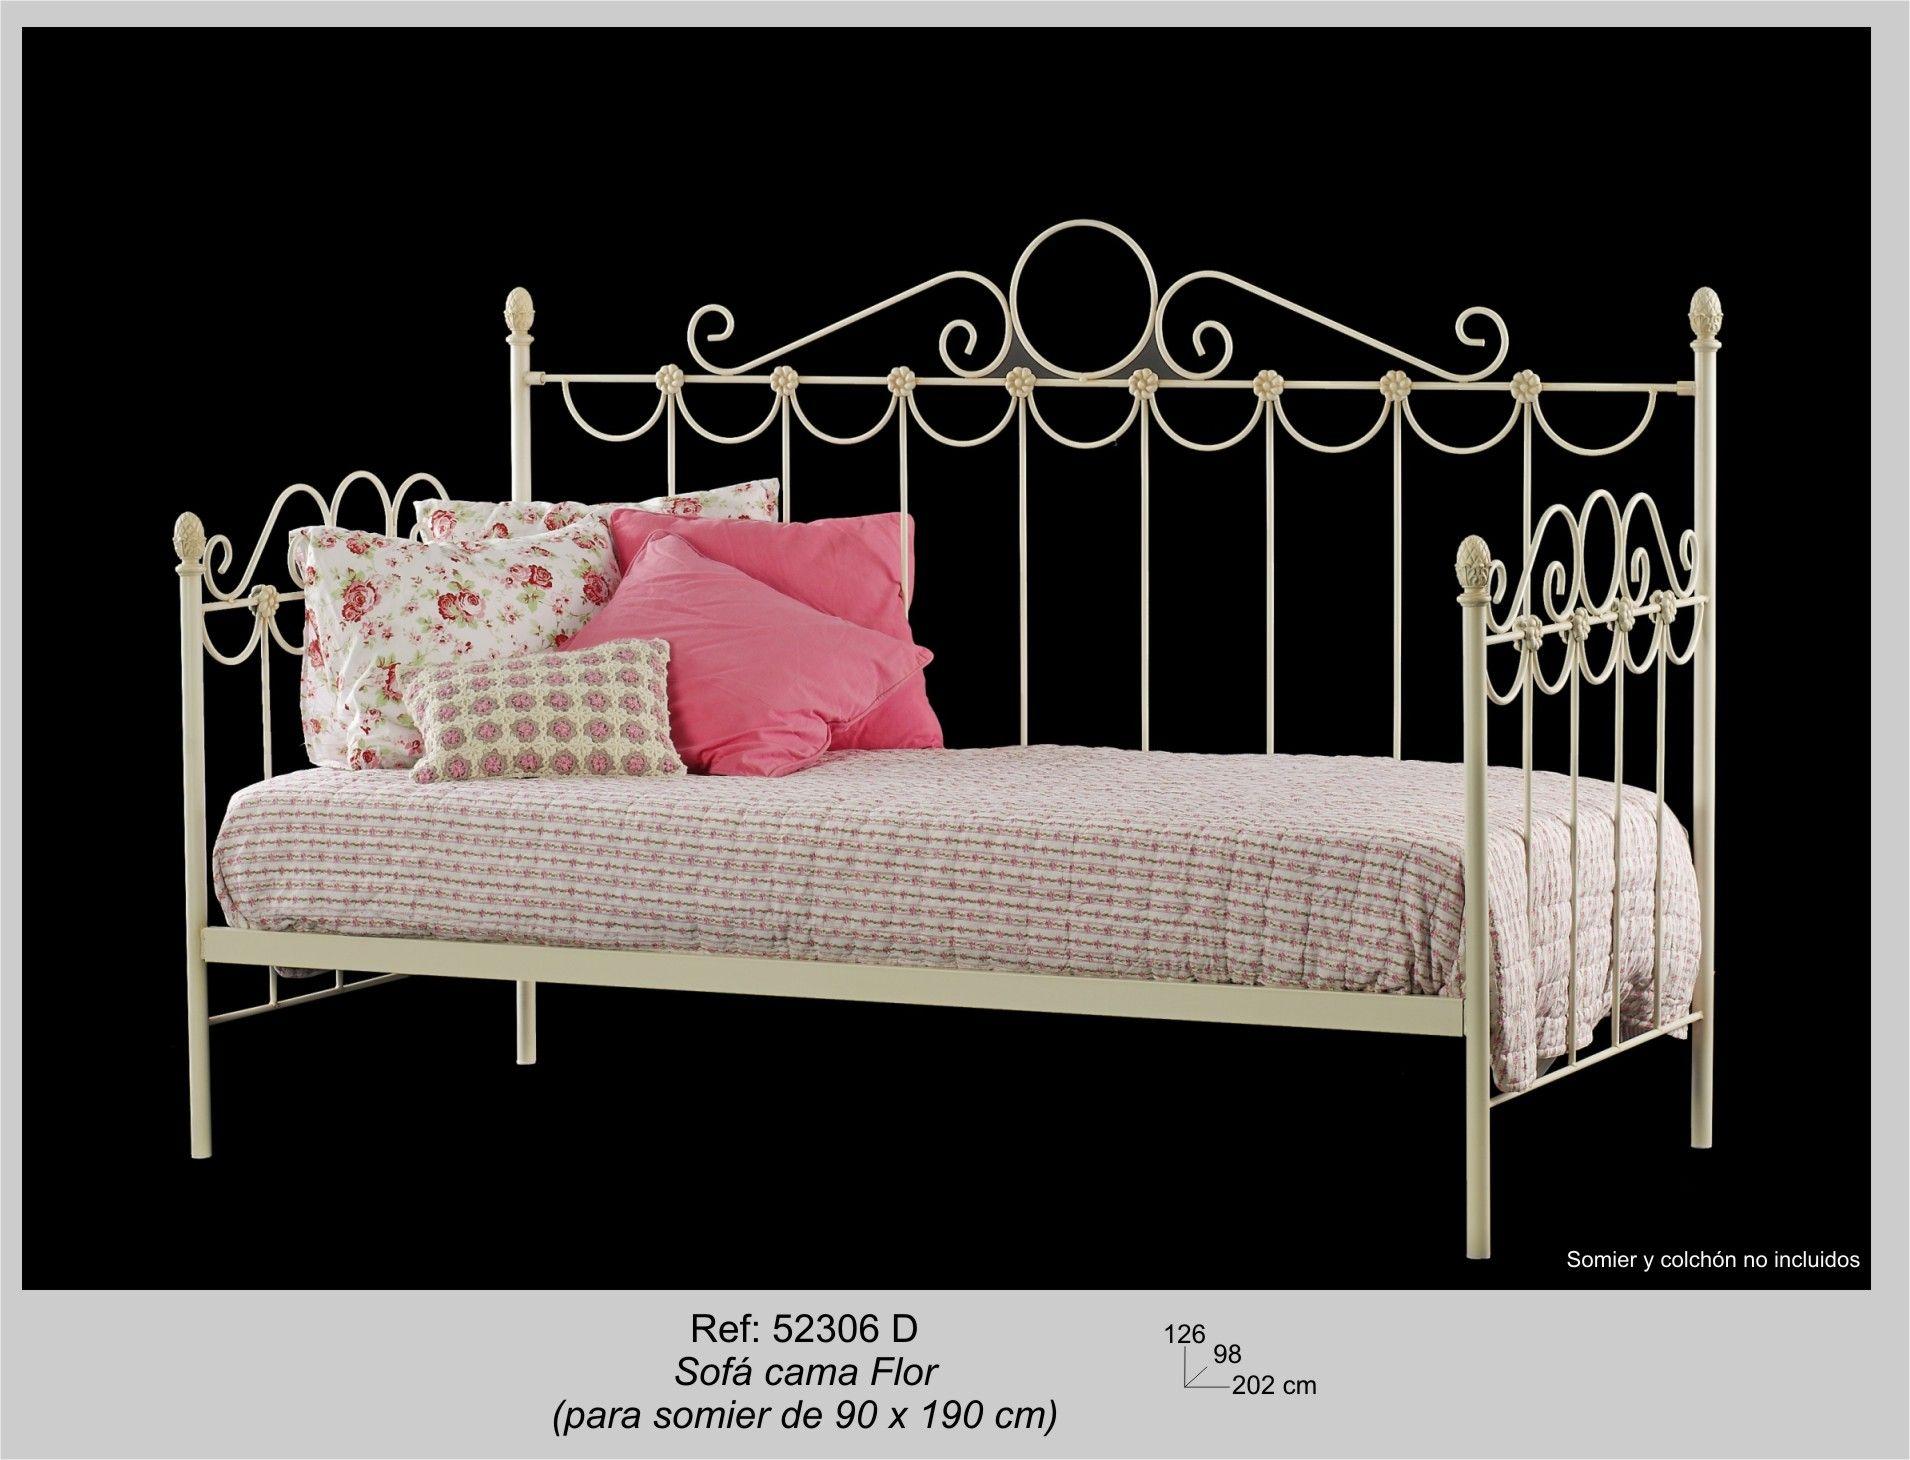 cama sofa forja modular leather sectional uk flor sin colchón y somier su estilo en